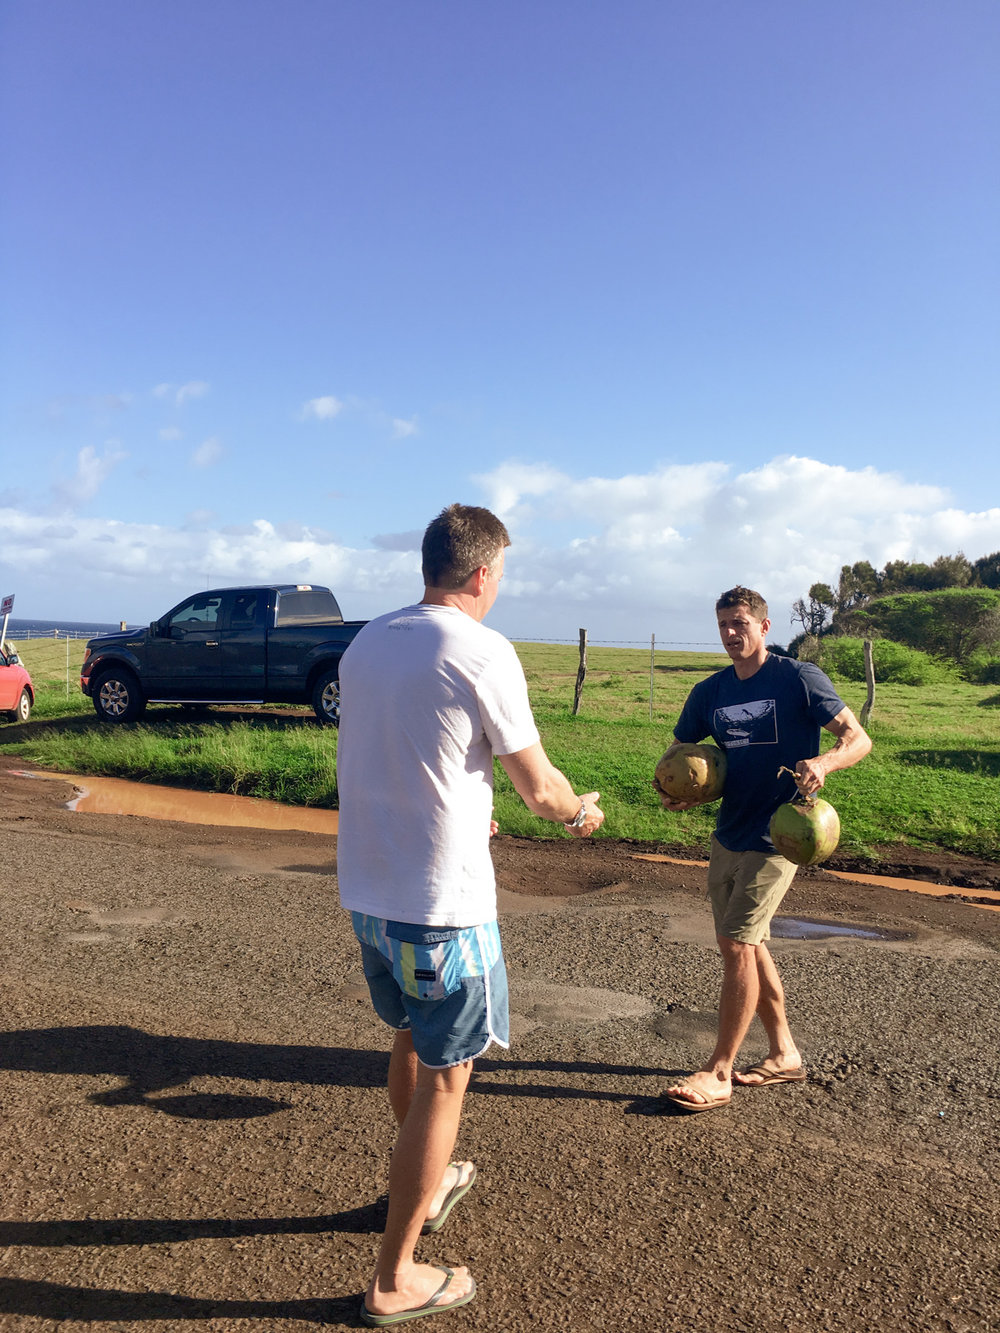 Maui-Trip-Kite-67.jpg